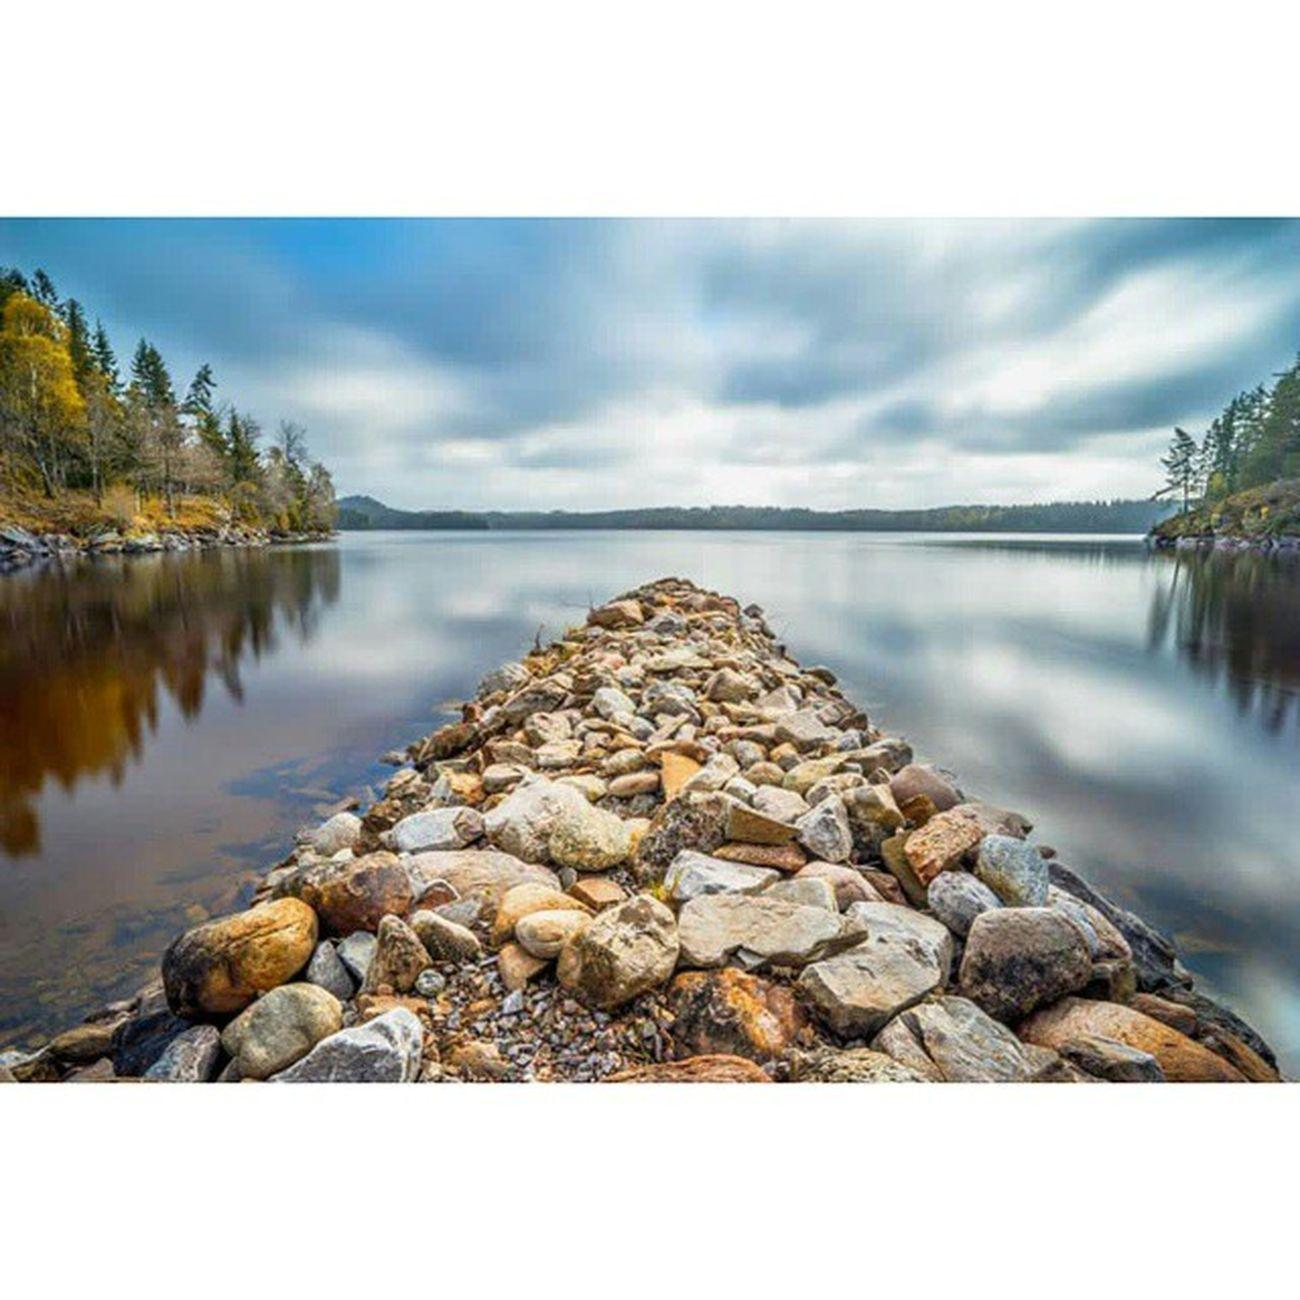 Jetty Pier Rocks Stone Water Lake Sweden Vastragotalandcounty Nyckelvattnet Calm Peaceful Nature